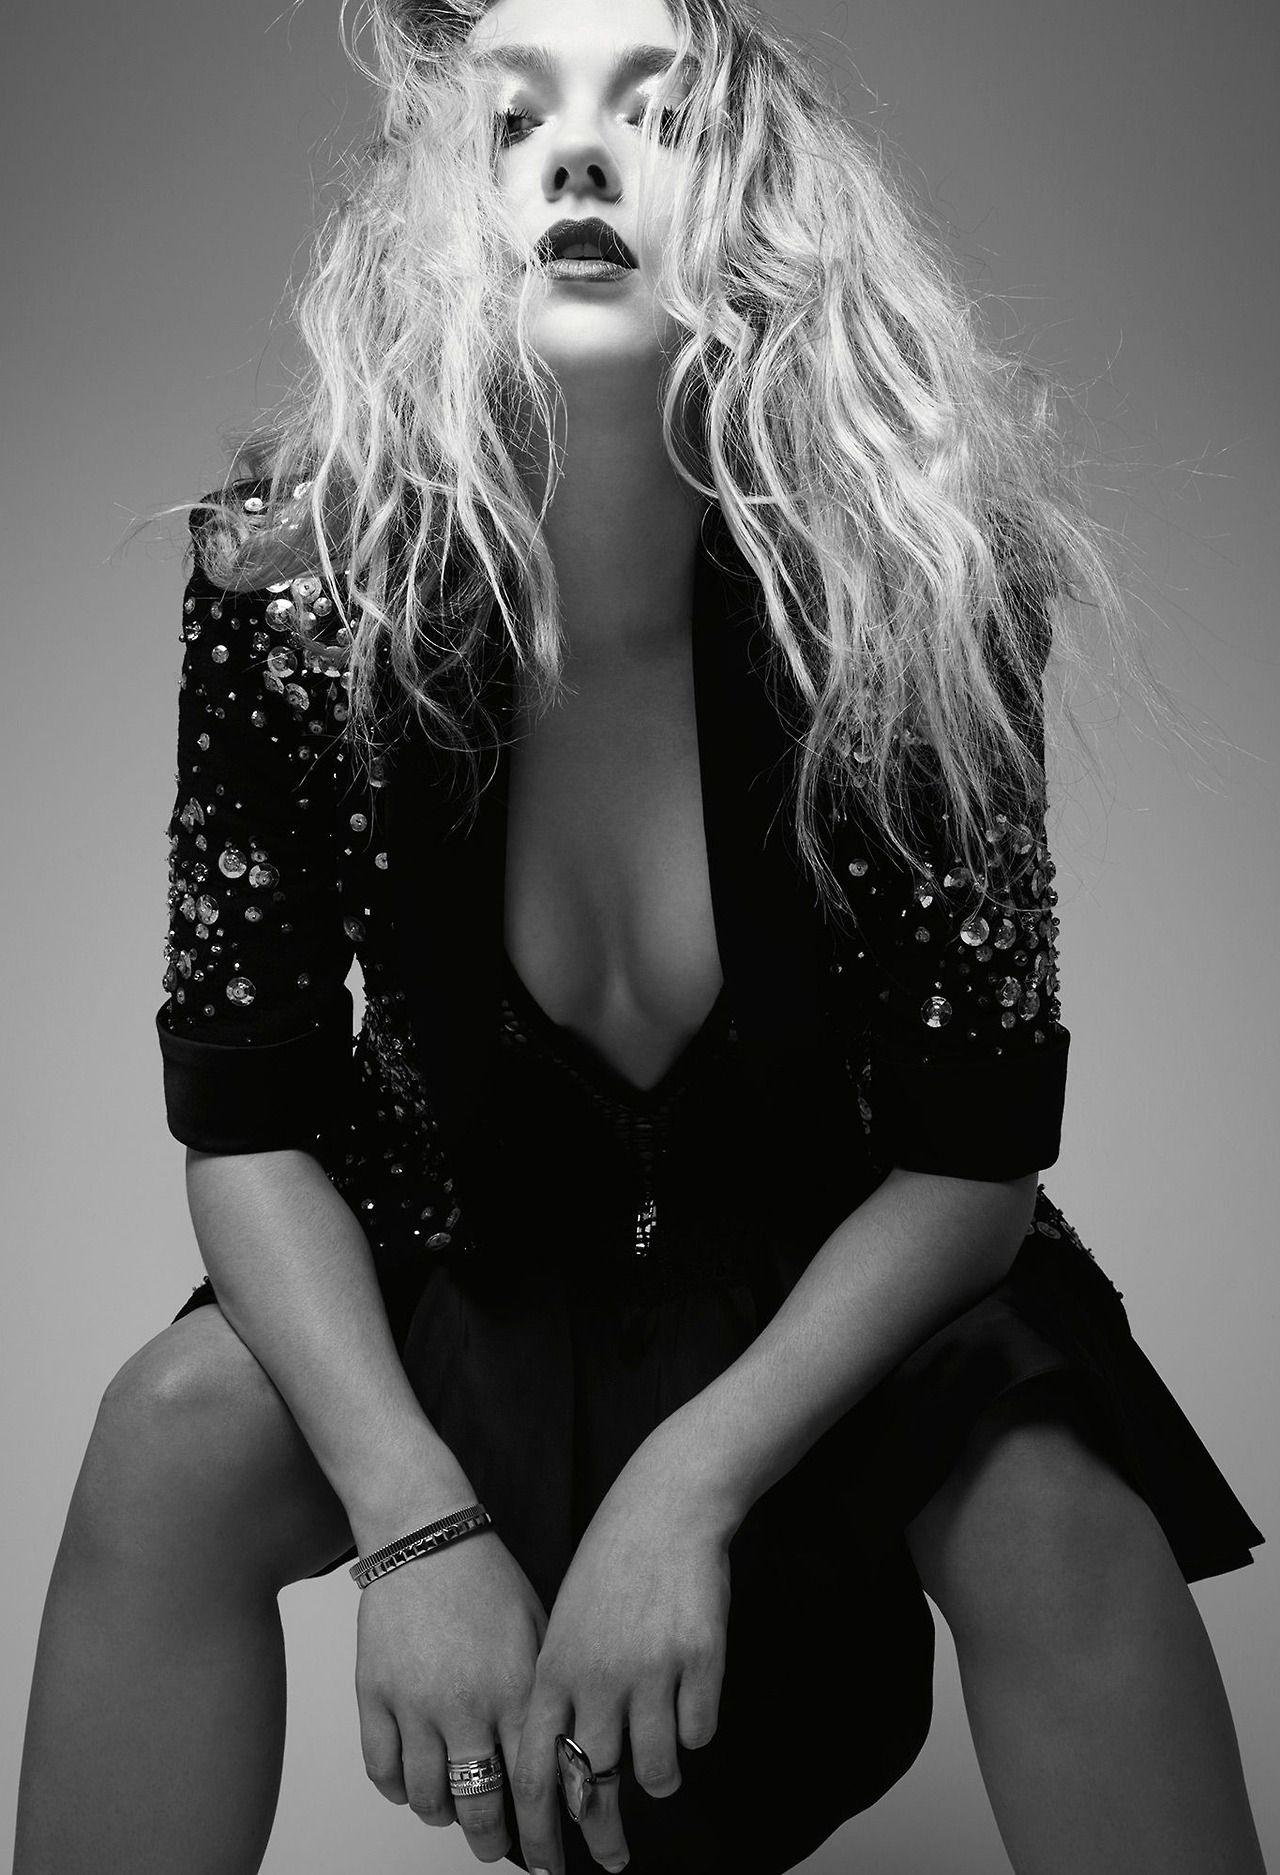 Celebrity Dina Roud nudes (13 photo), Tits, Paparazzi, Instagram, lingerie 2019